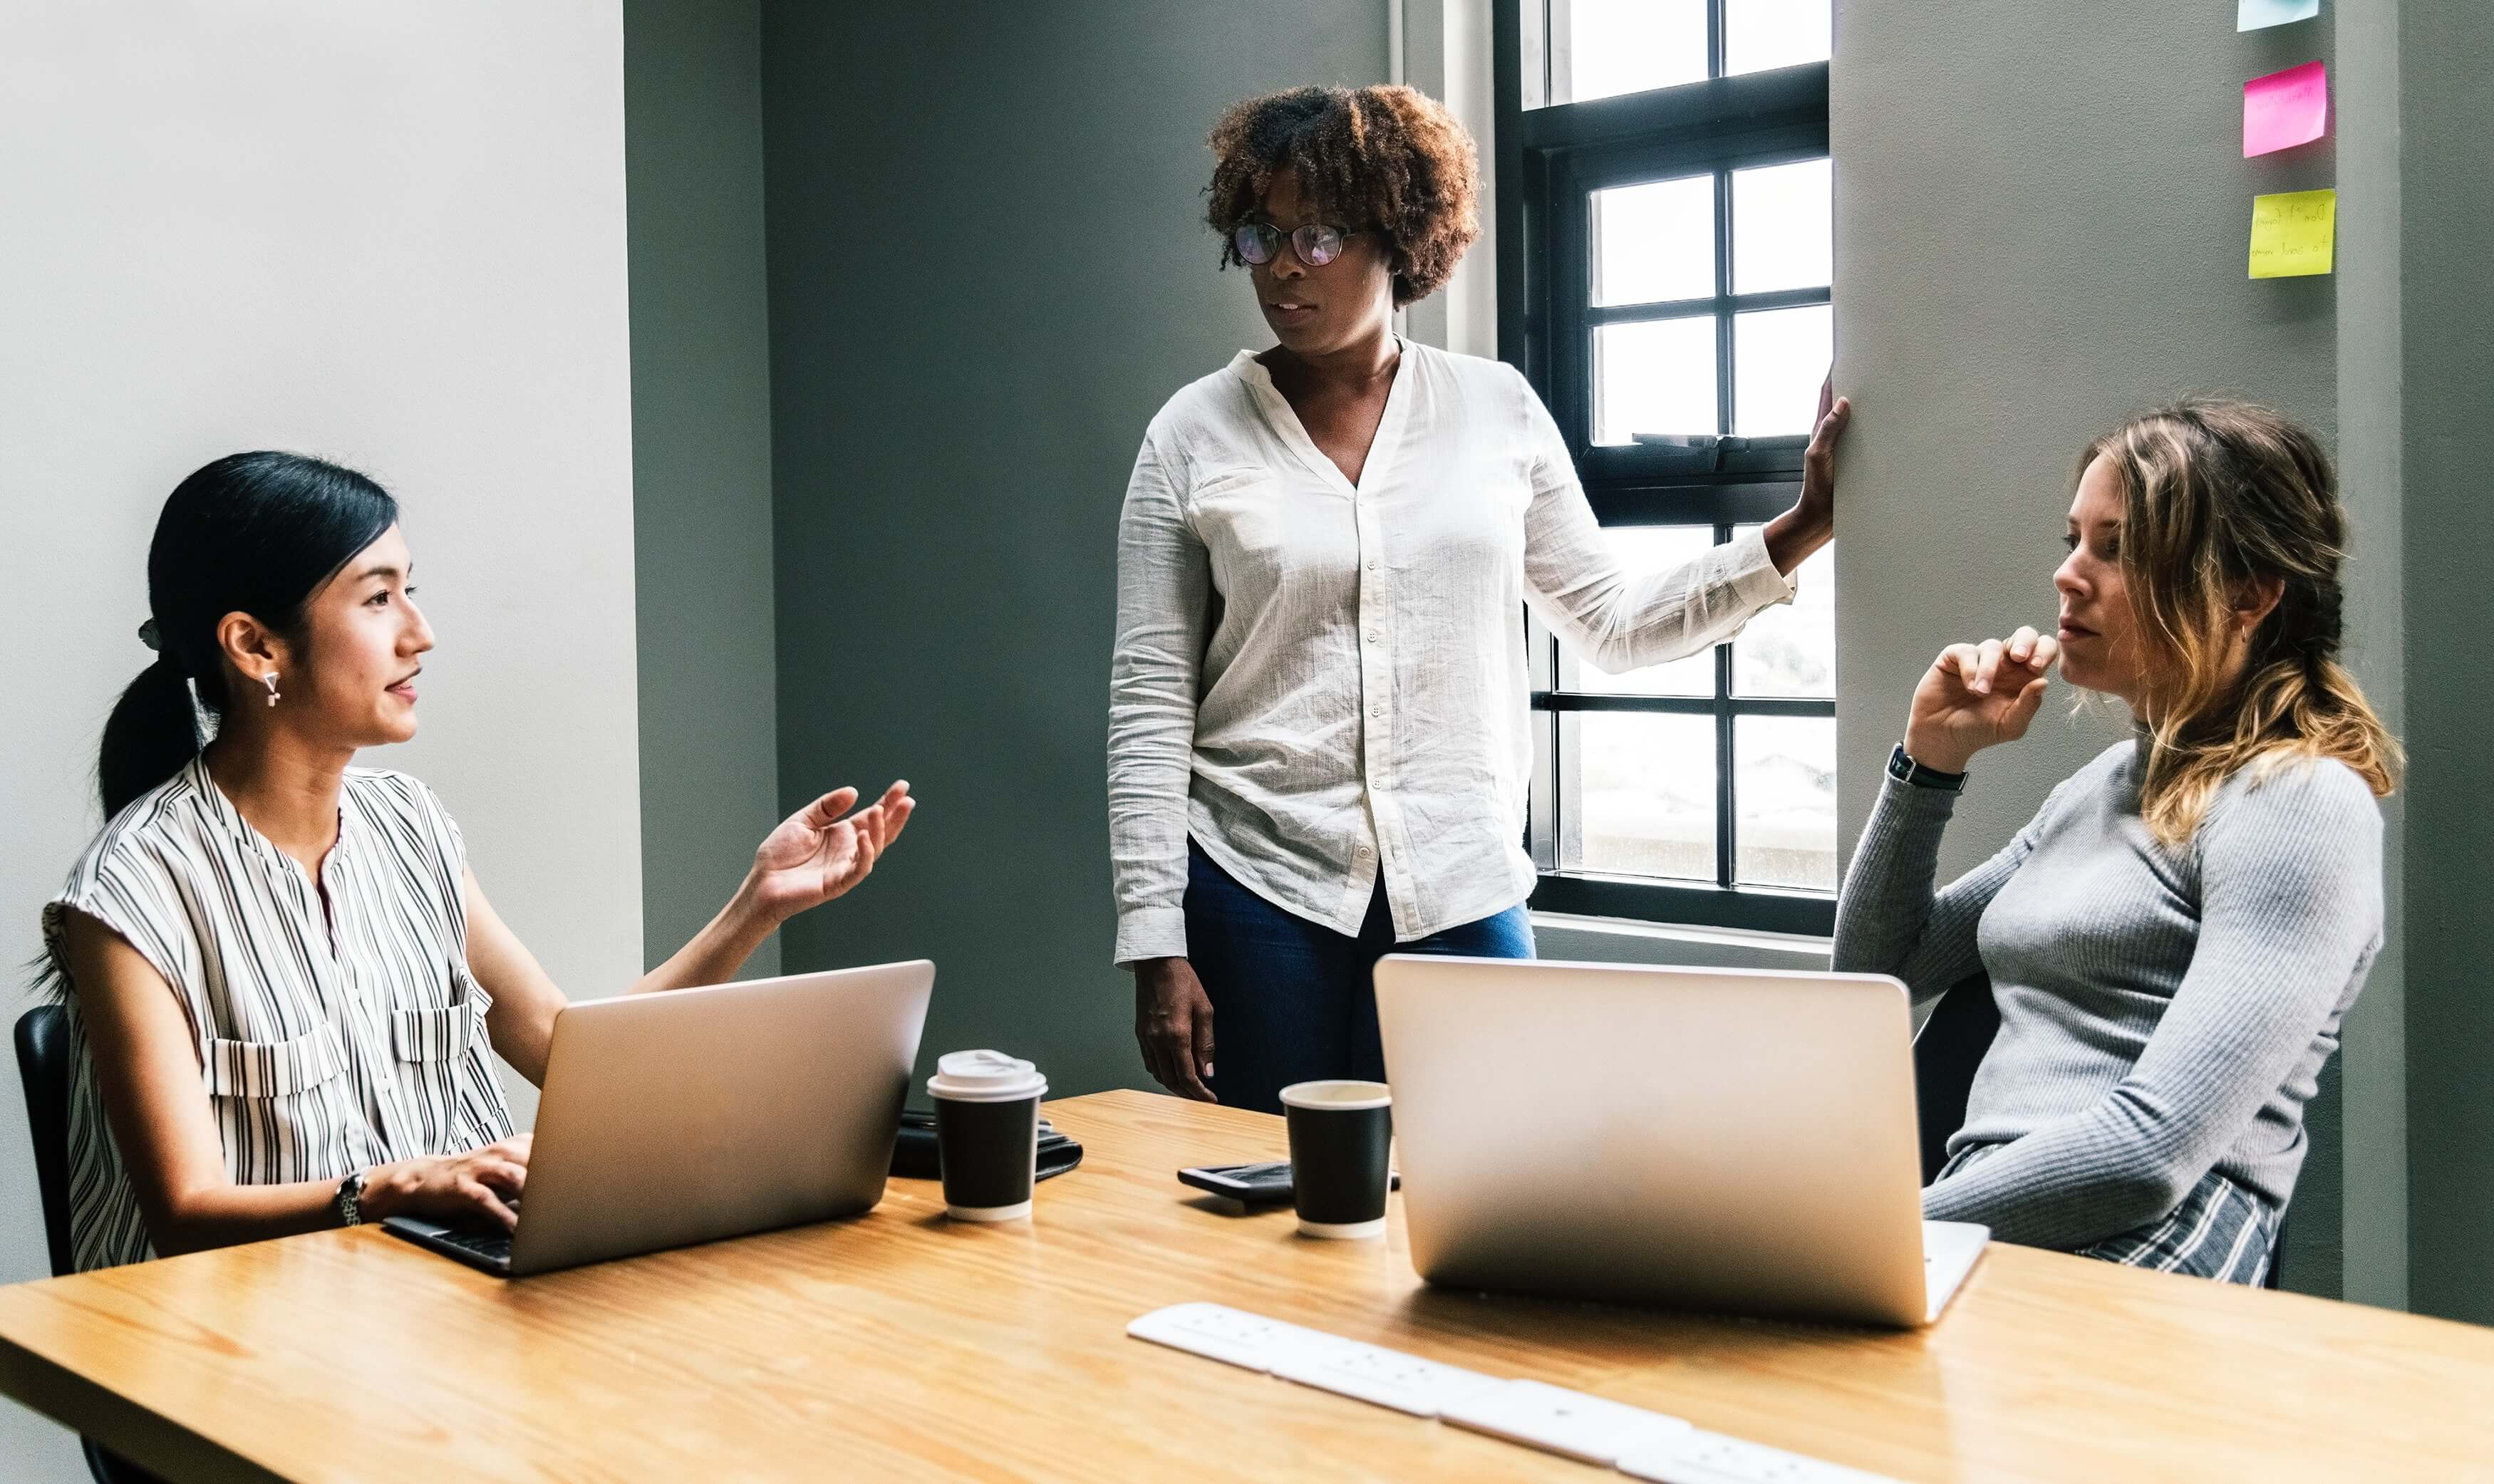 An image of 3 women having a workshop meeting